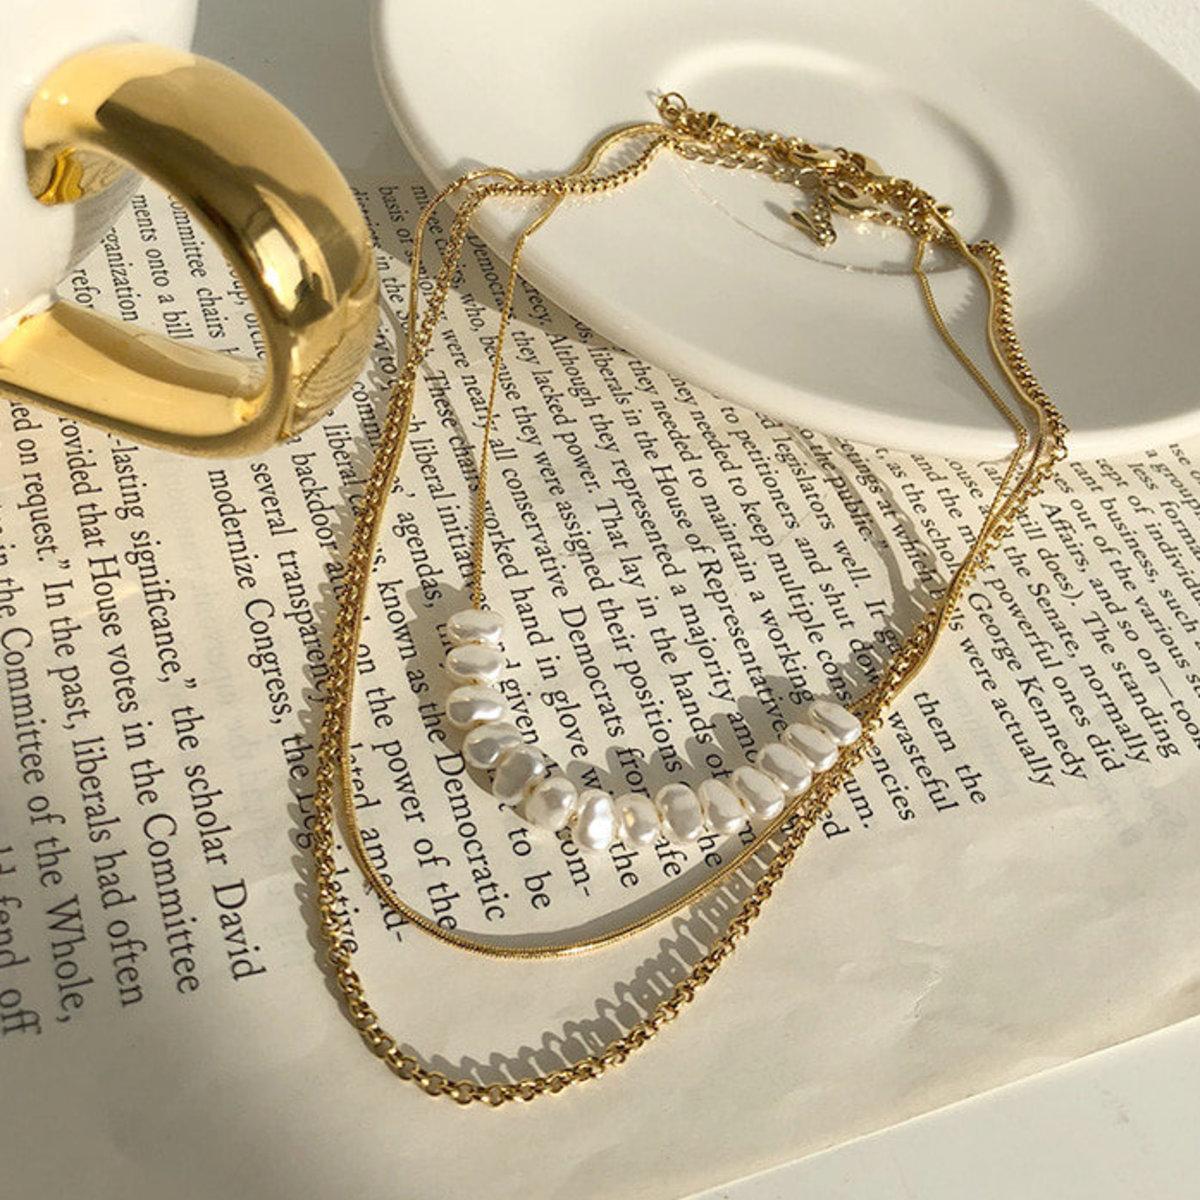 3-Piece Mixed Gold-Tone Necklace Set